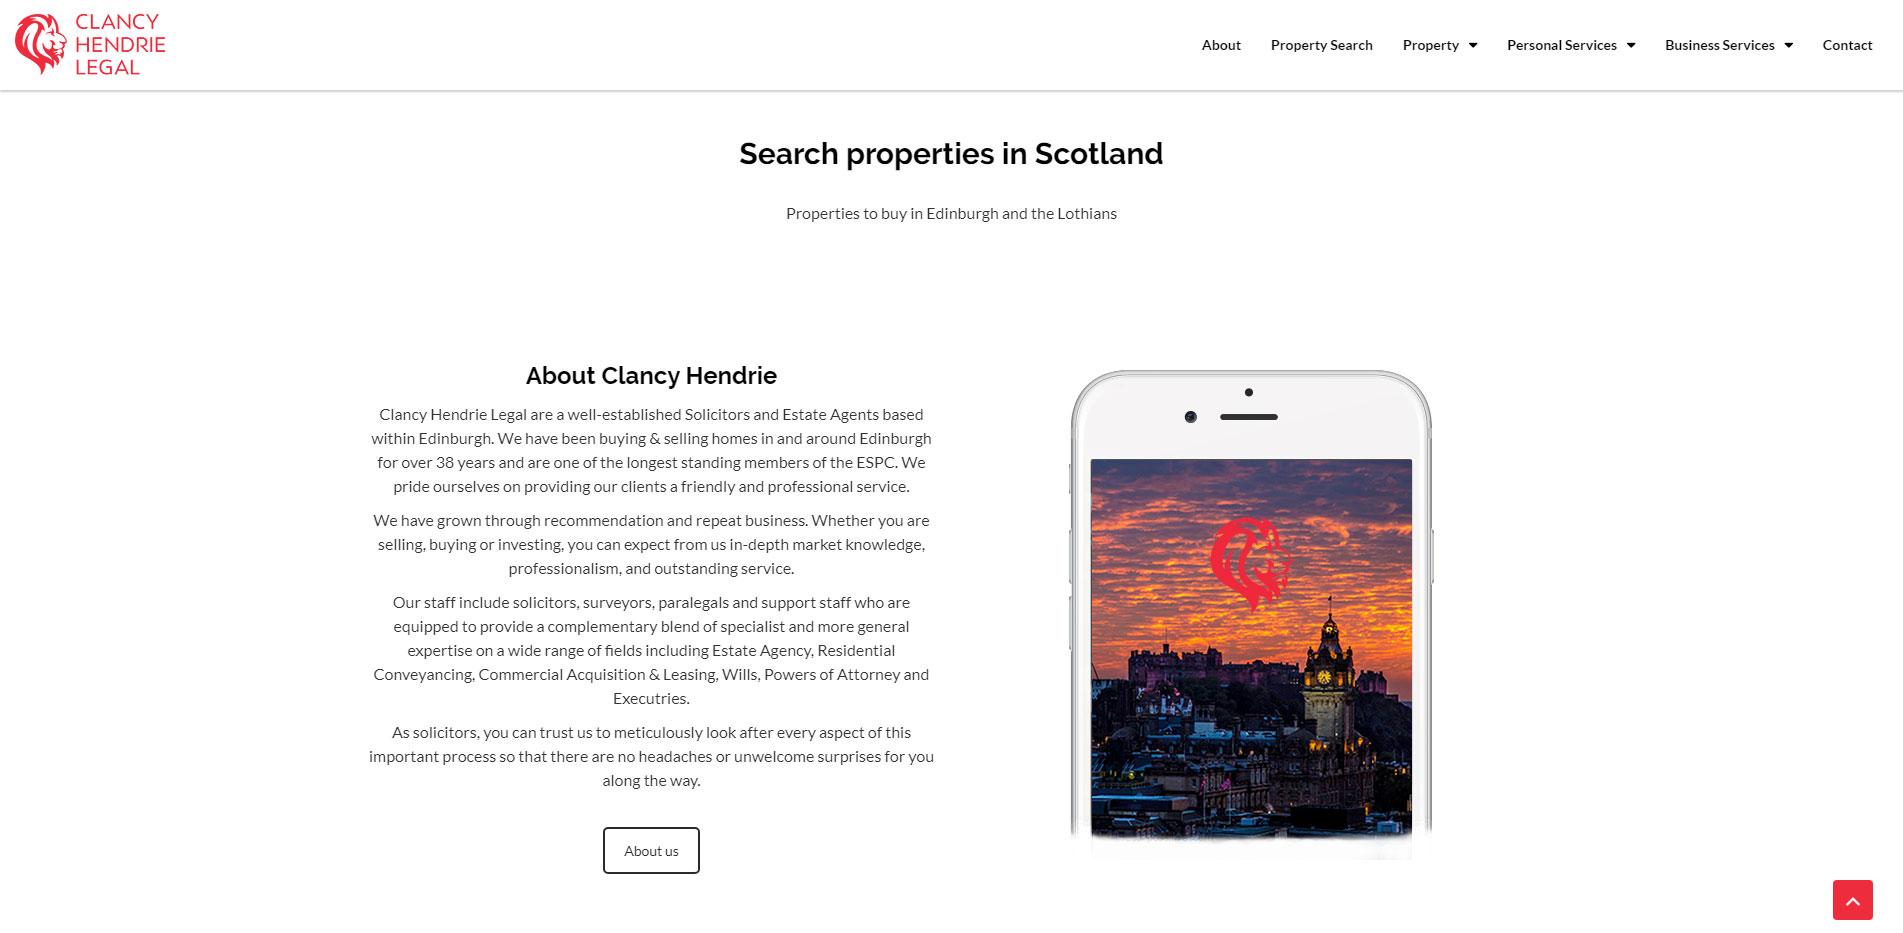 Clancy Hendrie Legal Homepage